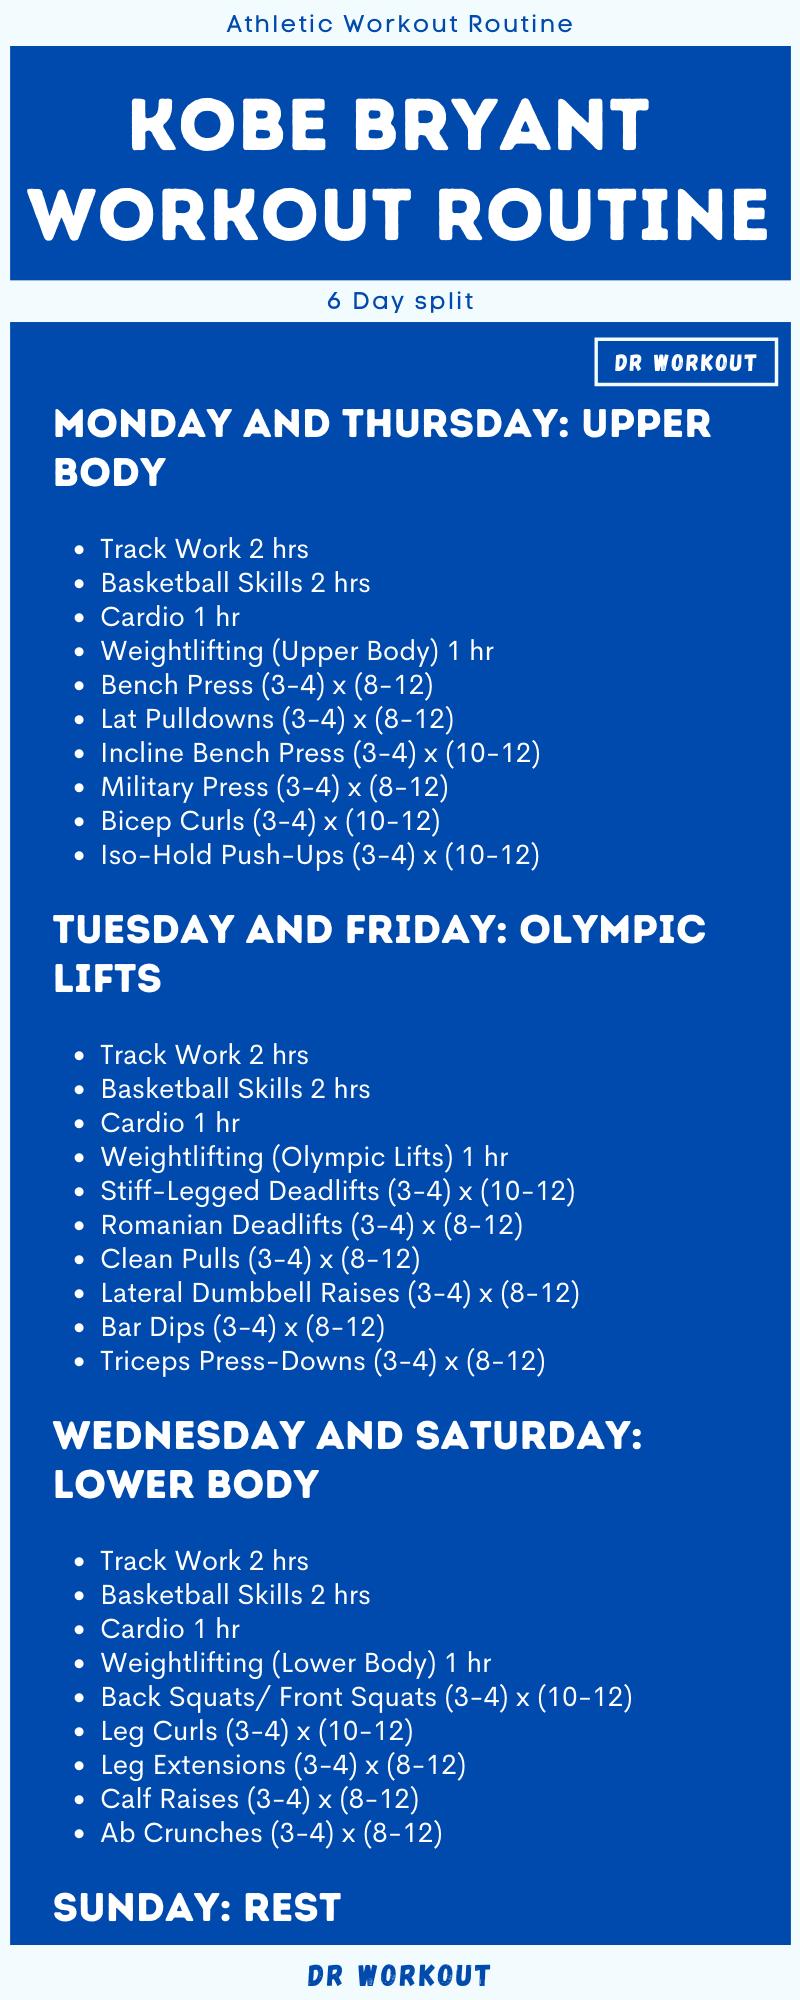 Kobe Bryant Workout Routine